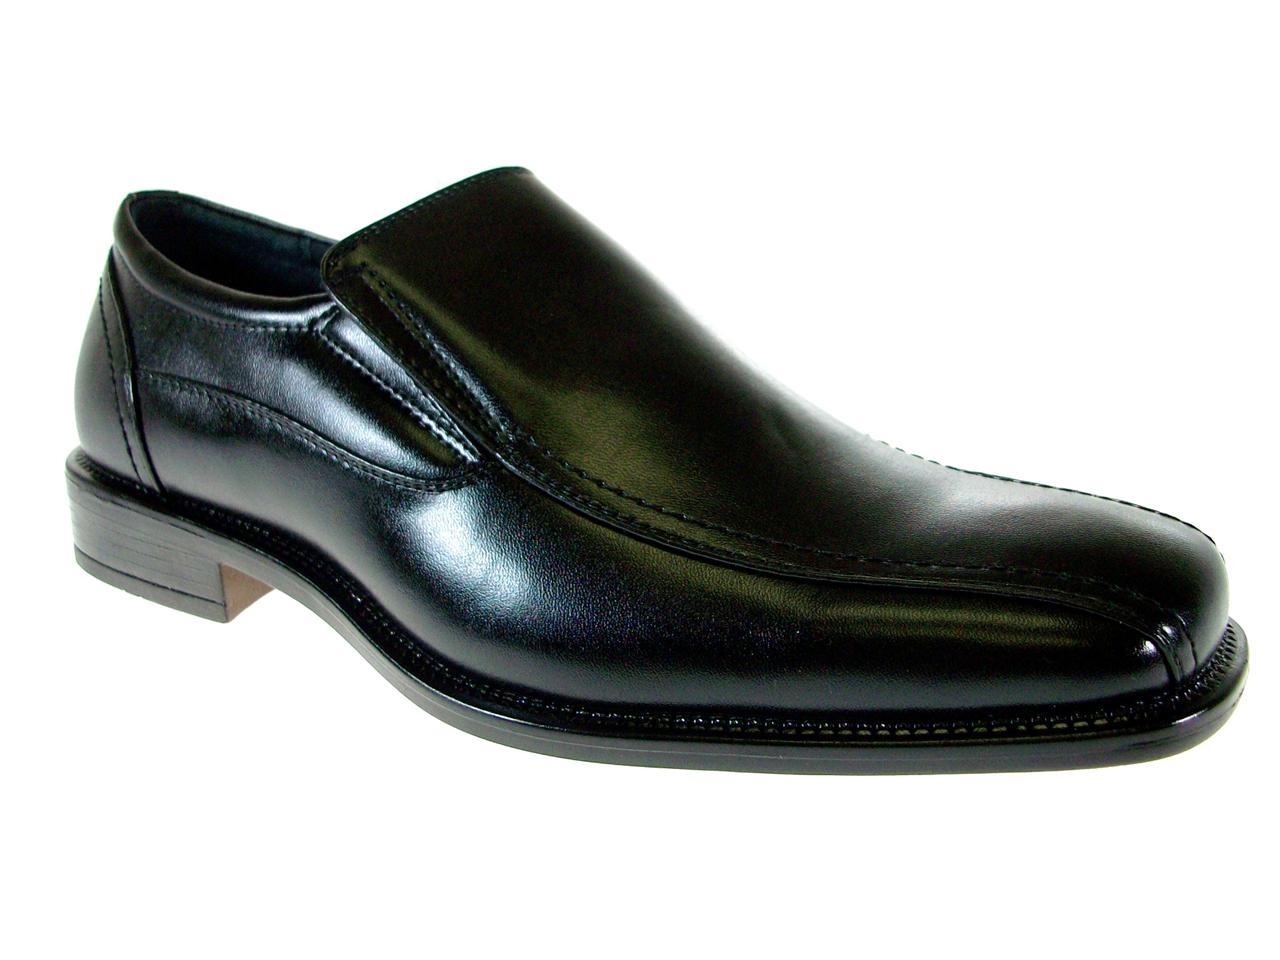 delli aldo mens slip on leather lined loafers dress